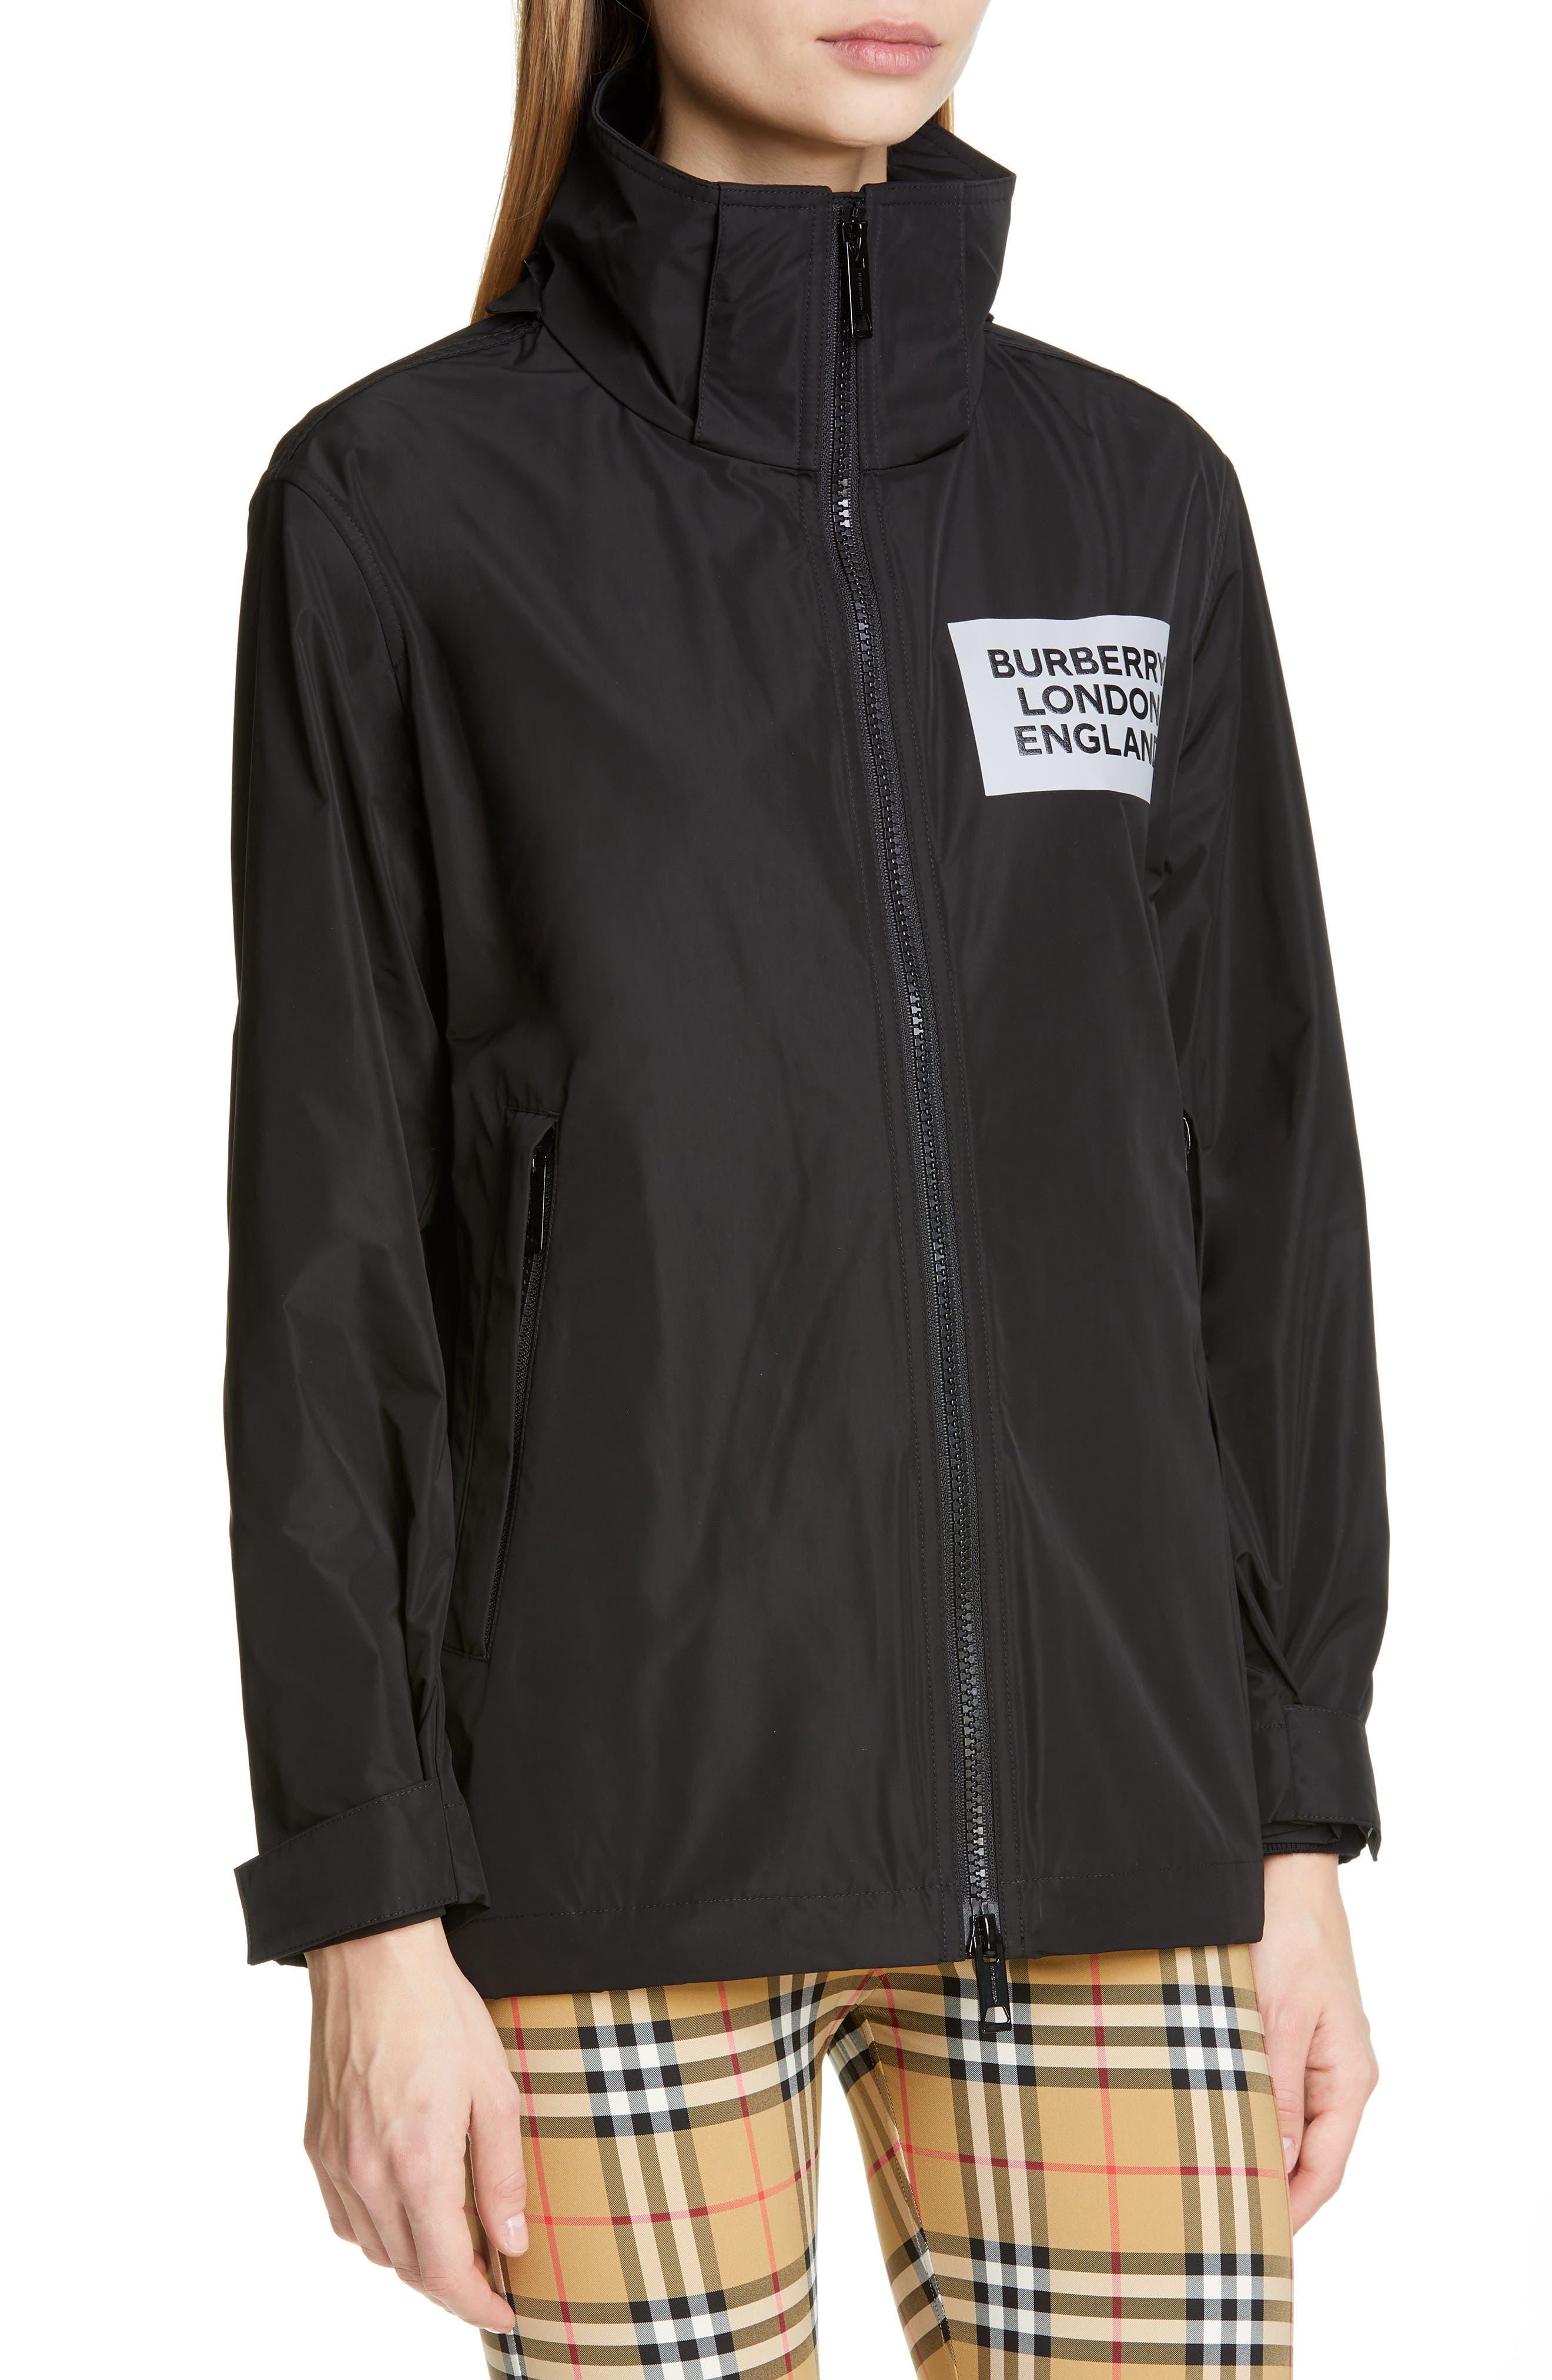 BURBERRY, Kway Millport Logo Print Waterproof Taffeta Jacket, Alternate thumbnail 2, color, BLACK